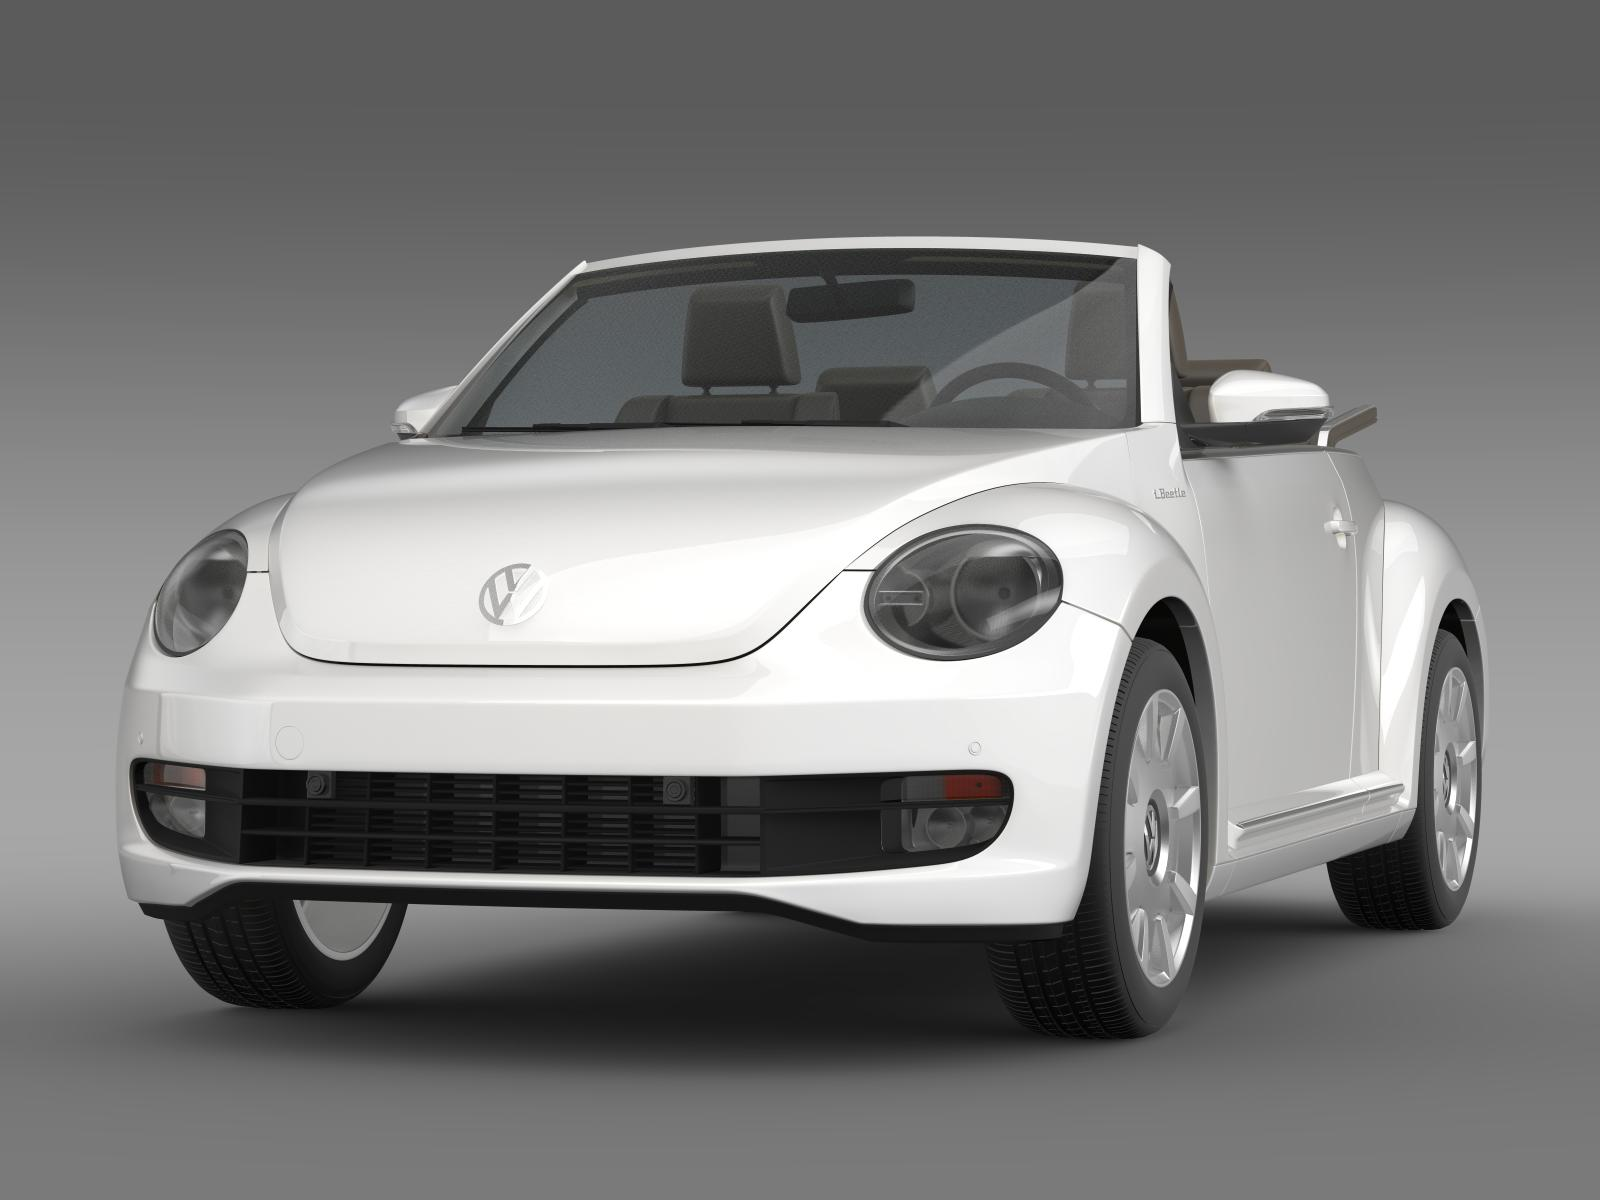 vw i beetle cabrio 2015 3d model flatpyramid. Black Bedroom Furniture Sets. Home Design Ideas